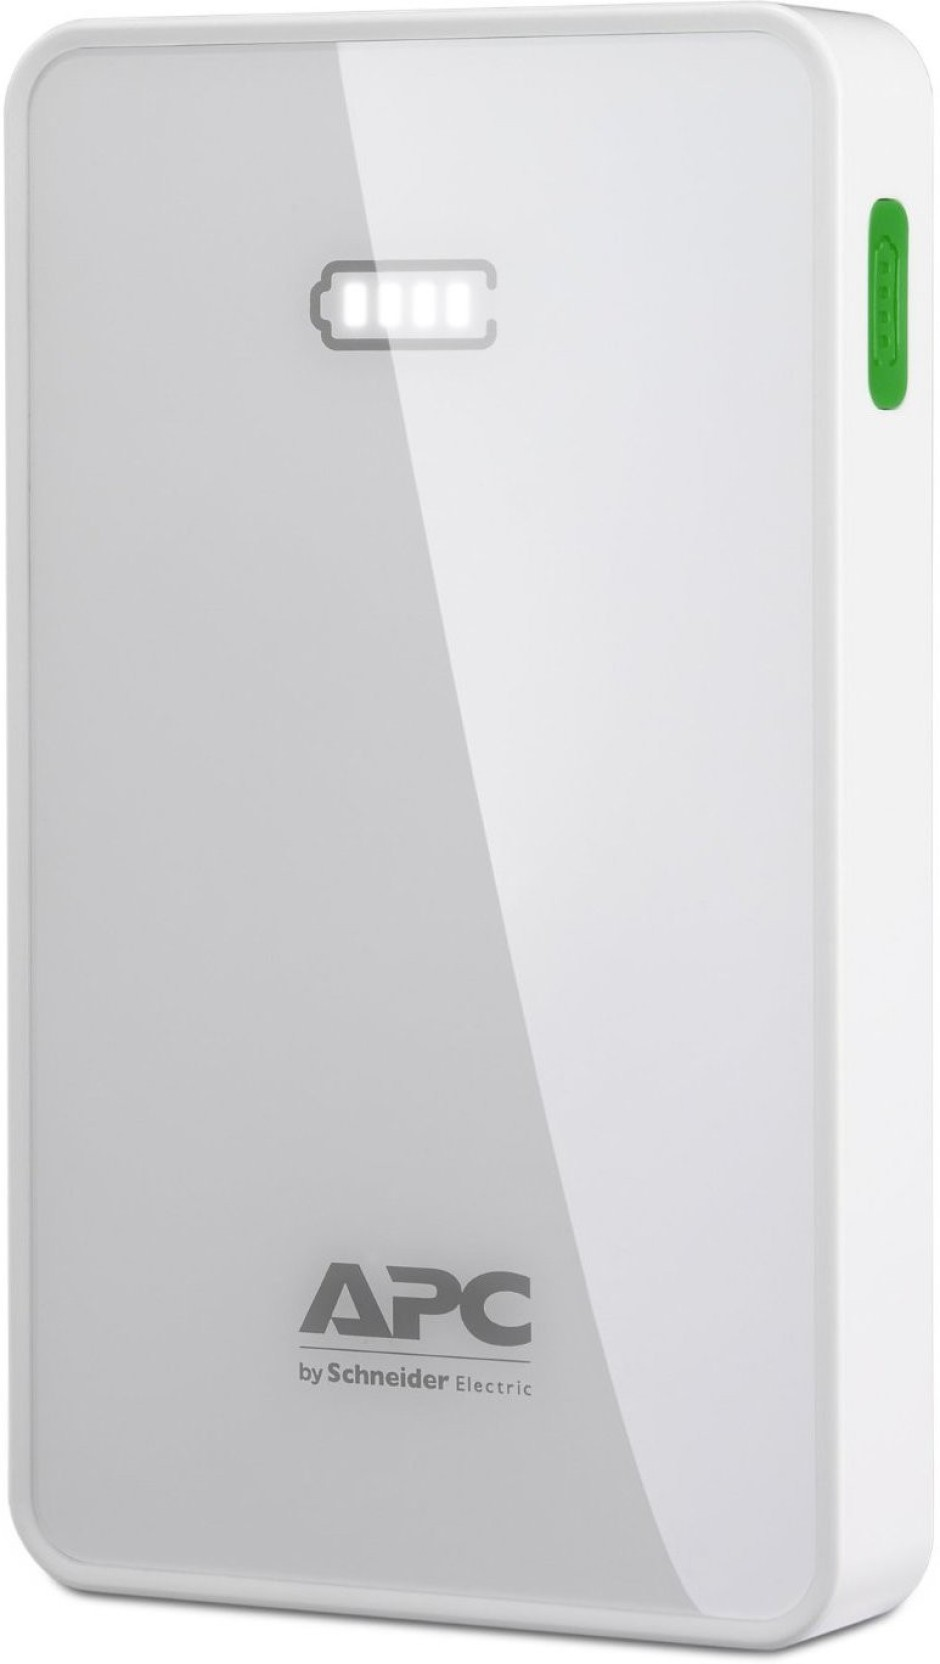 Apc 10000 Mah Power Bank M10wh In Mobile Pack 10000mah Bestseller Xiaomi Powerbank Mi Pro 2 Fast Charging Add To Cart